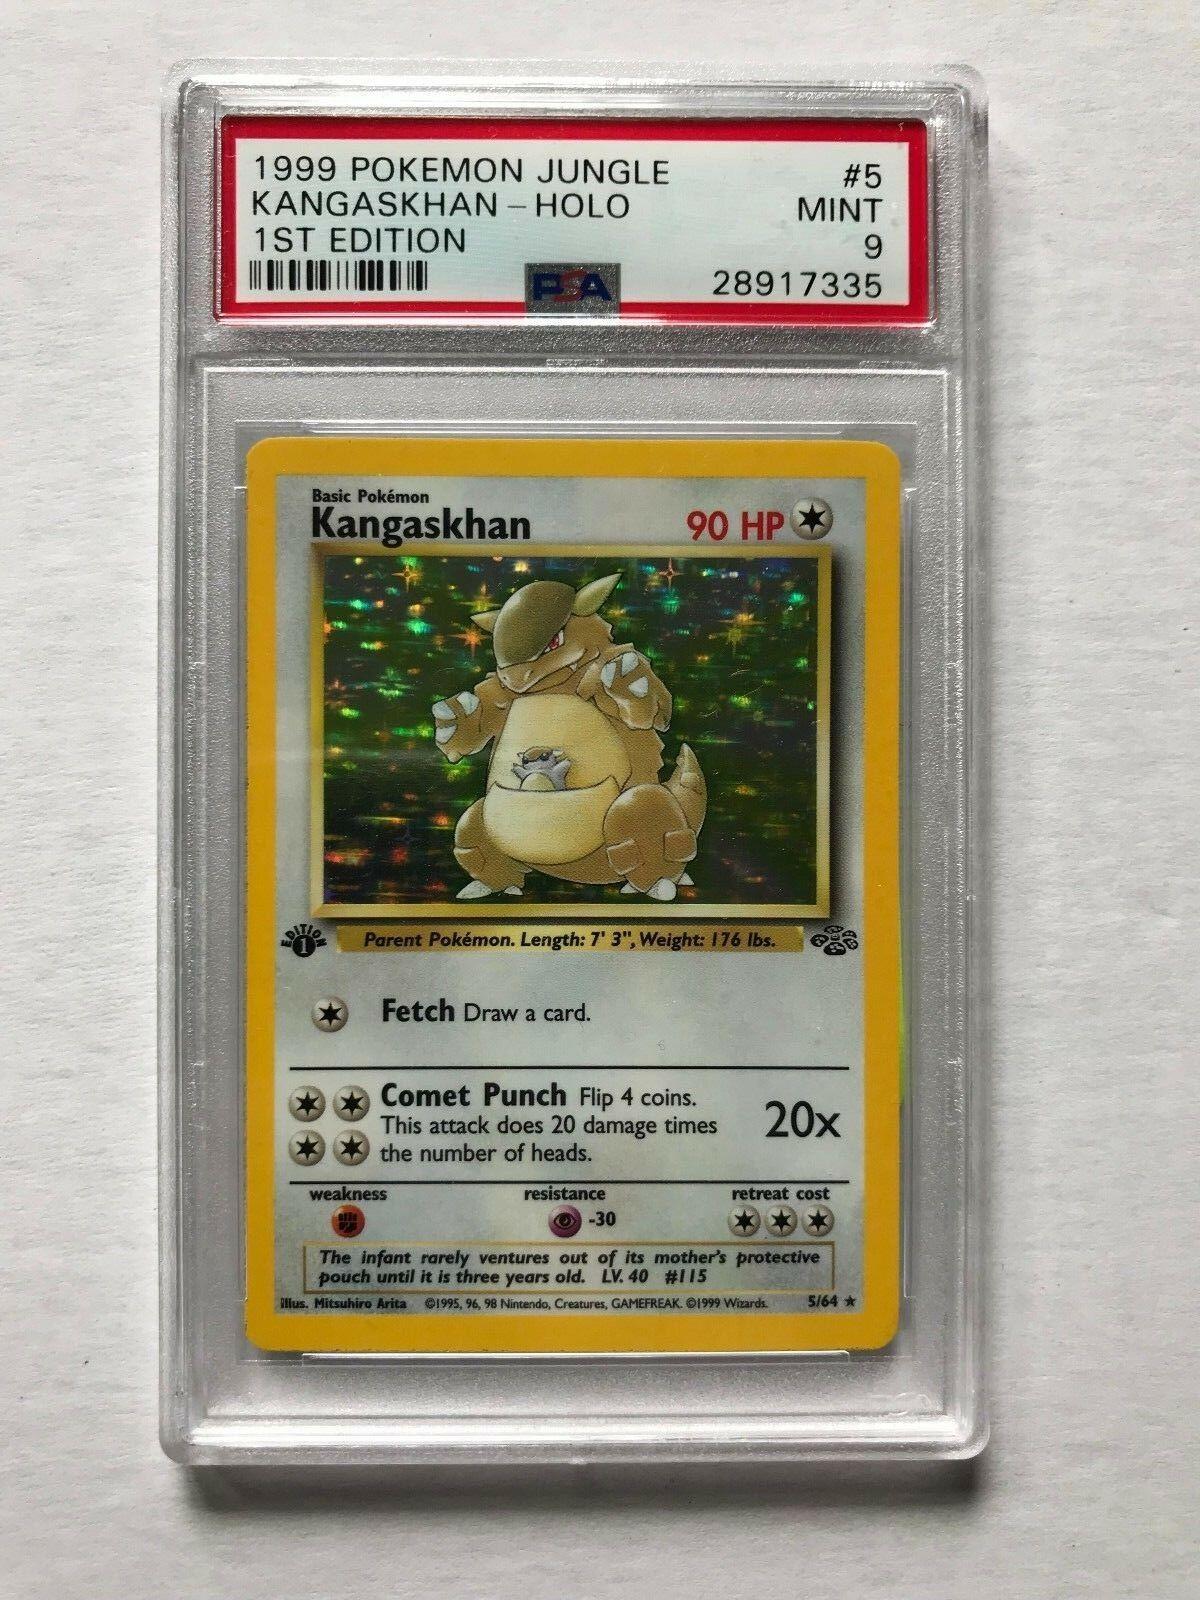 1999 Pokemon Card 1st Edition Kangaskhan Holo Foil Jungle Graded PSA 9 Mint